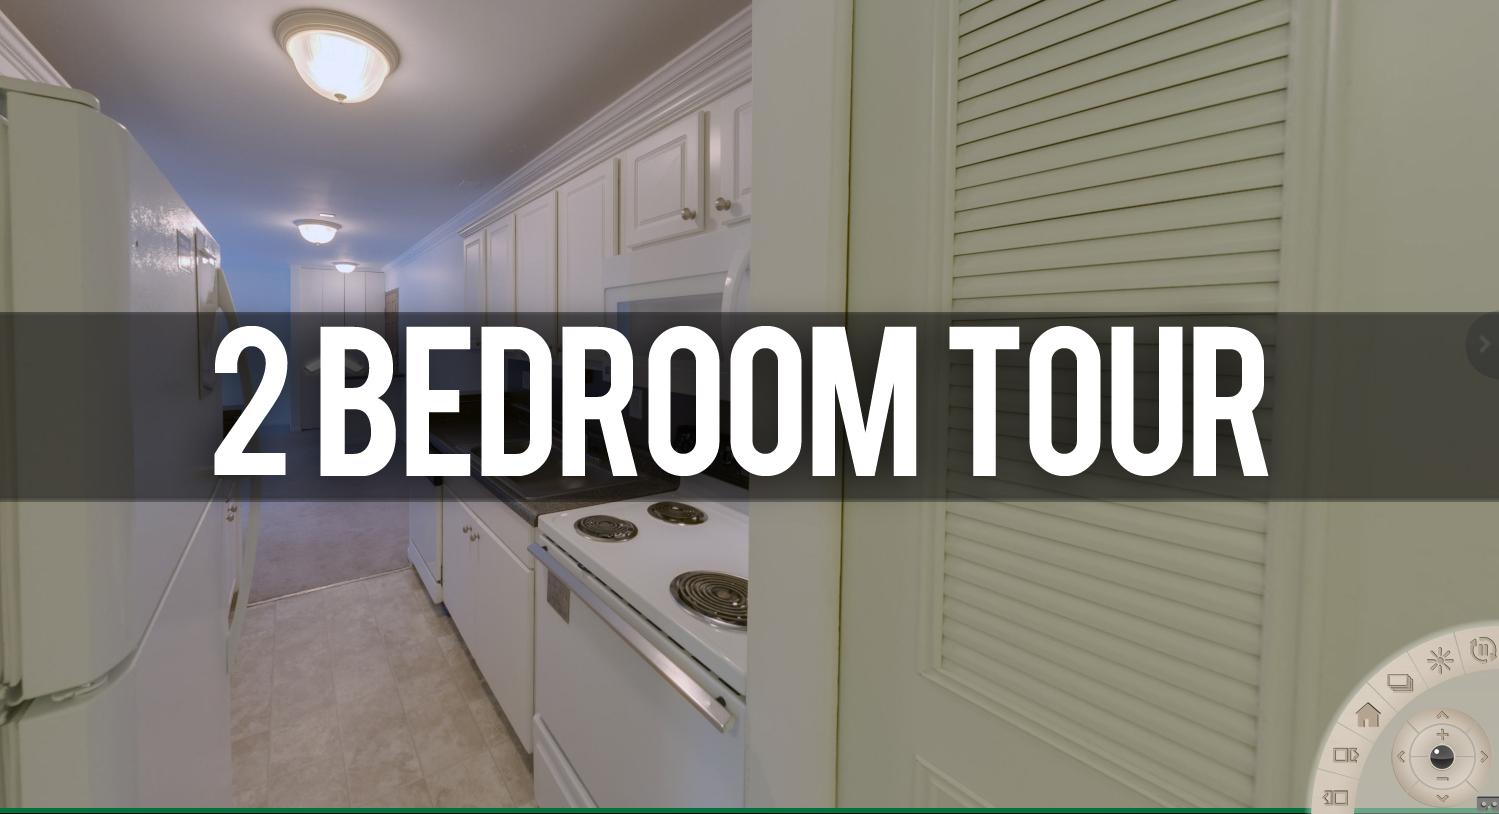 2 Bedroom Virtual Tour Berrytree Apartments in Okemos, MI